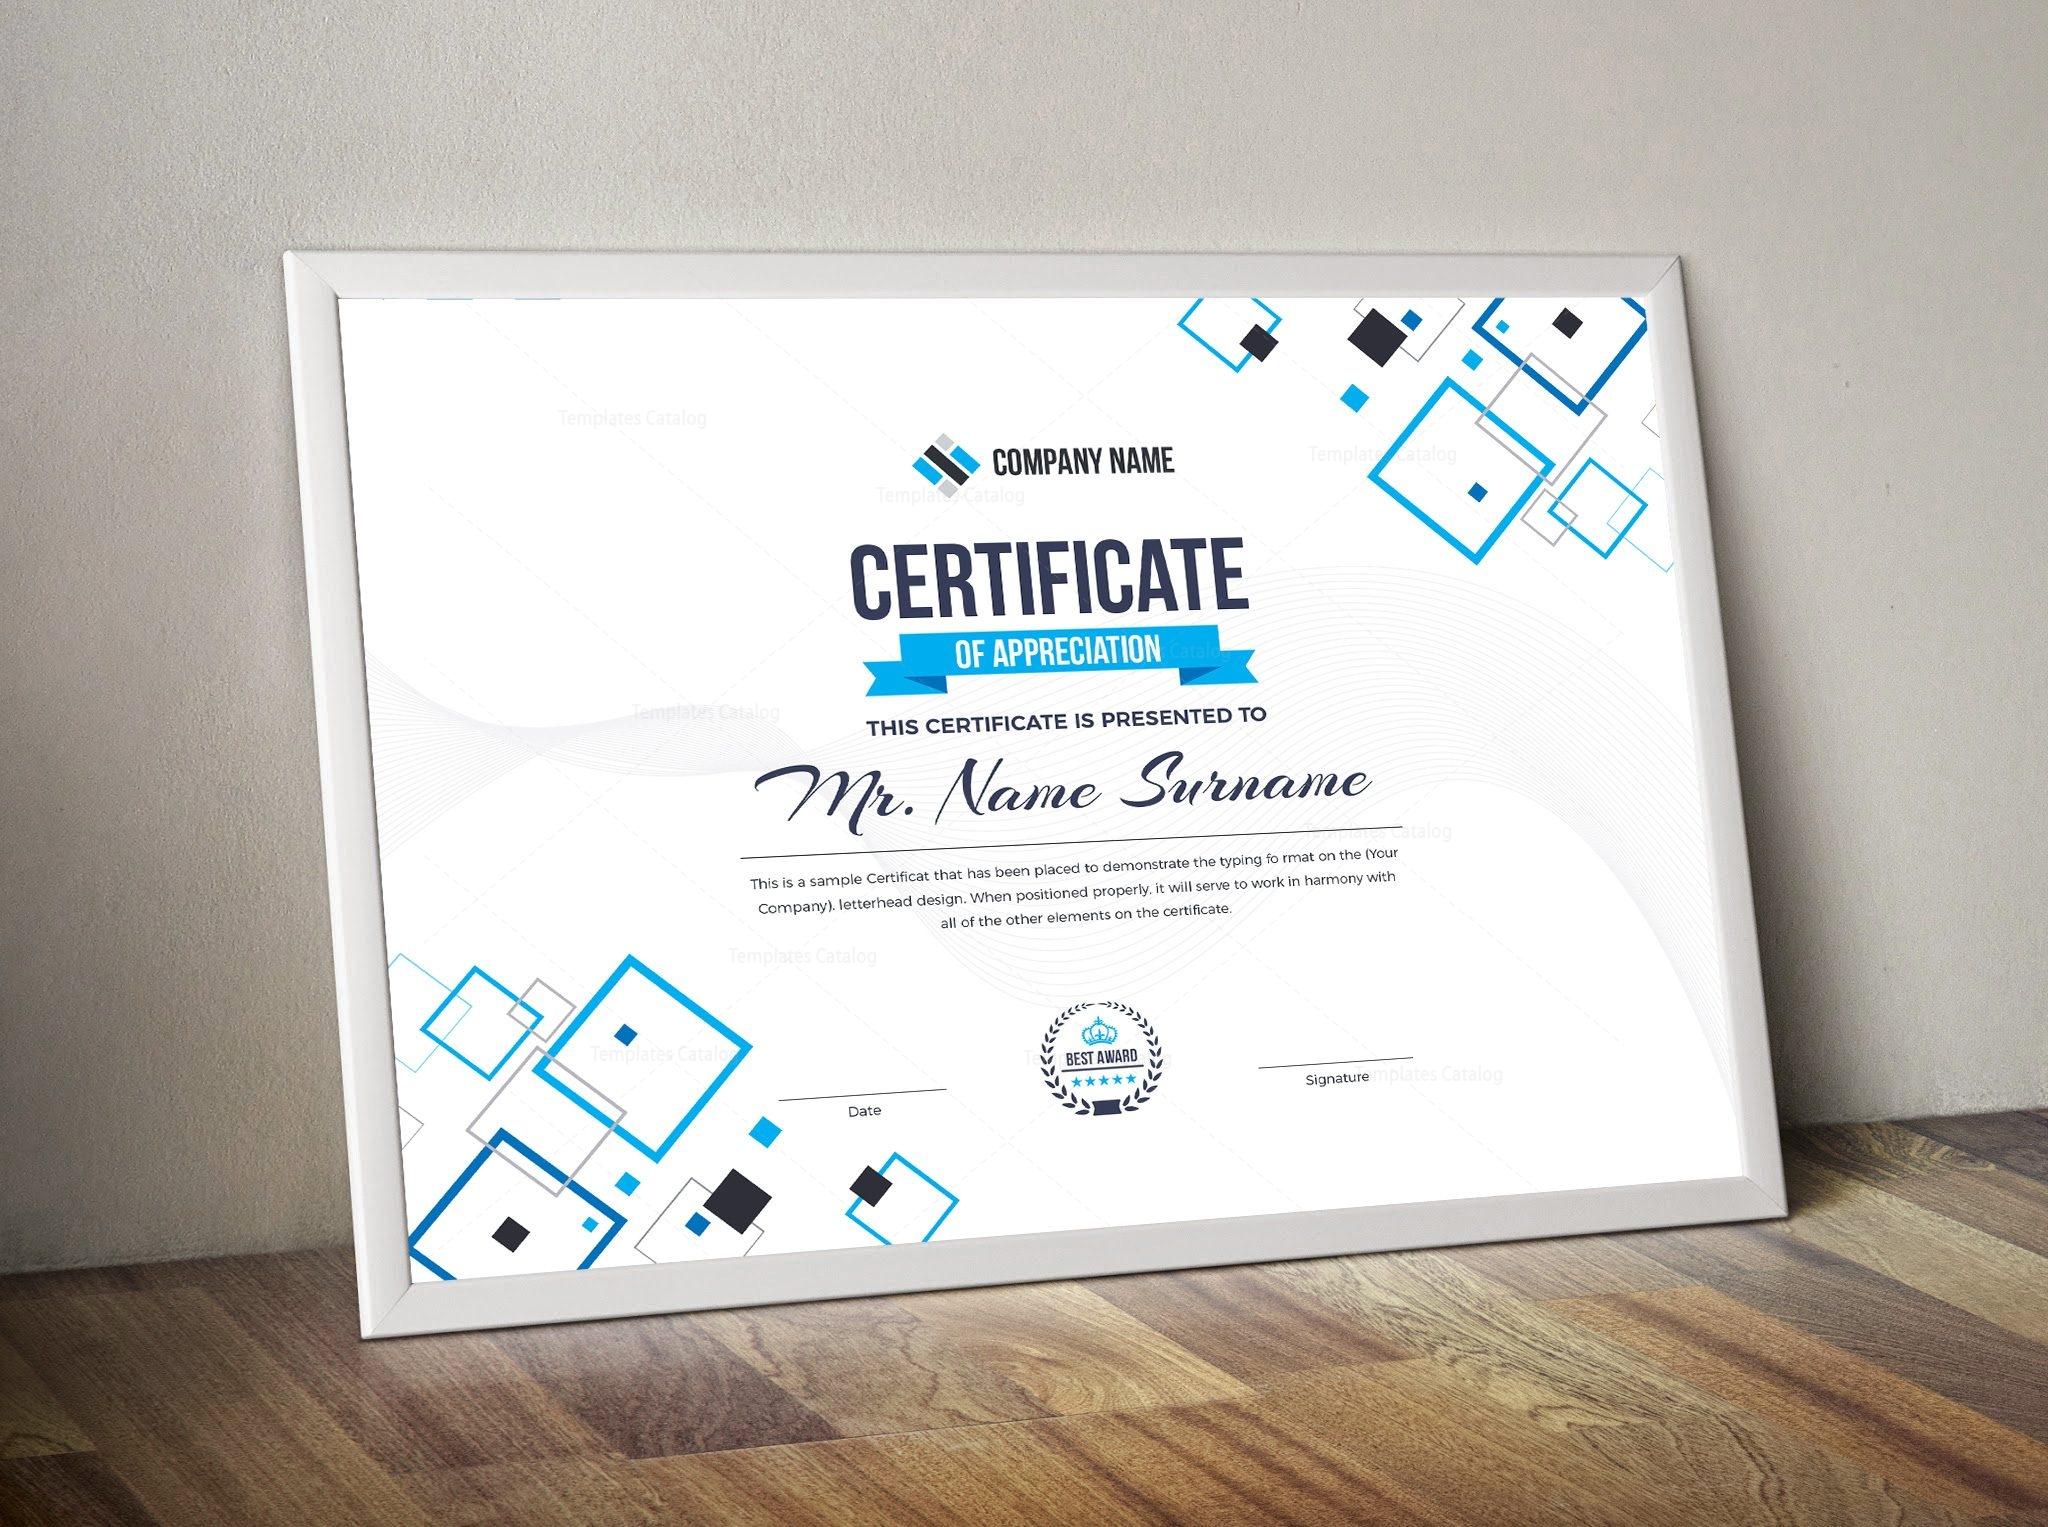 Hera Landscape Certificate Template 000839 - Template Catalog